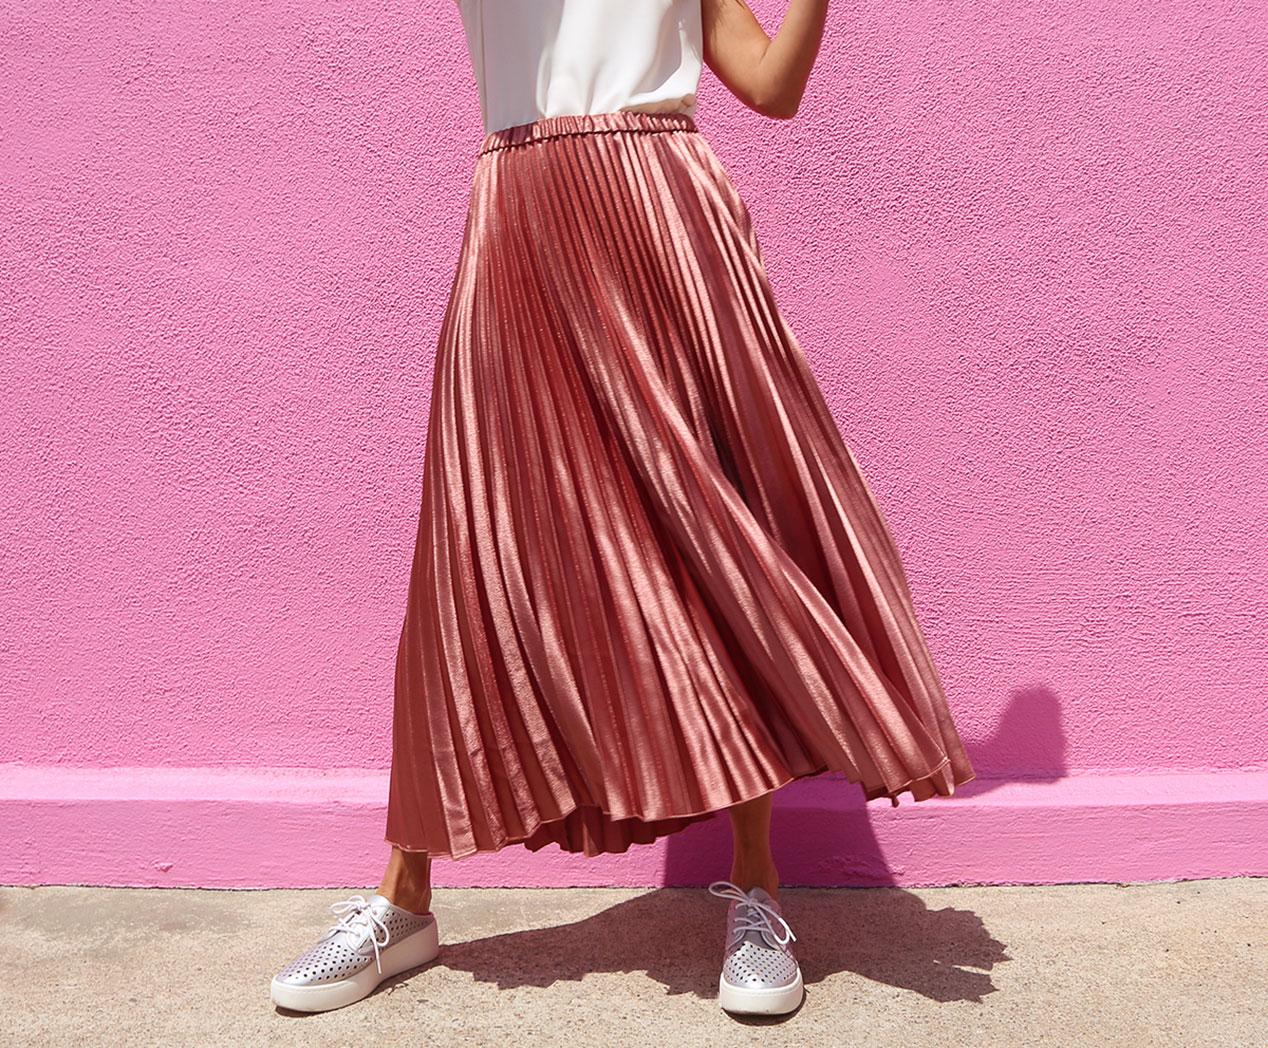 Skirt_2---ATELIER-Creative-Services,-Inc..jpg